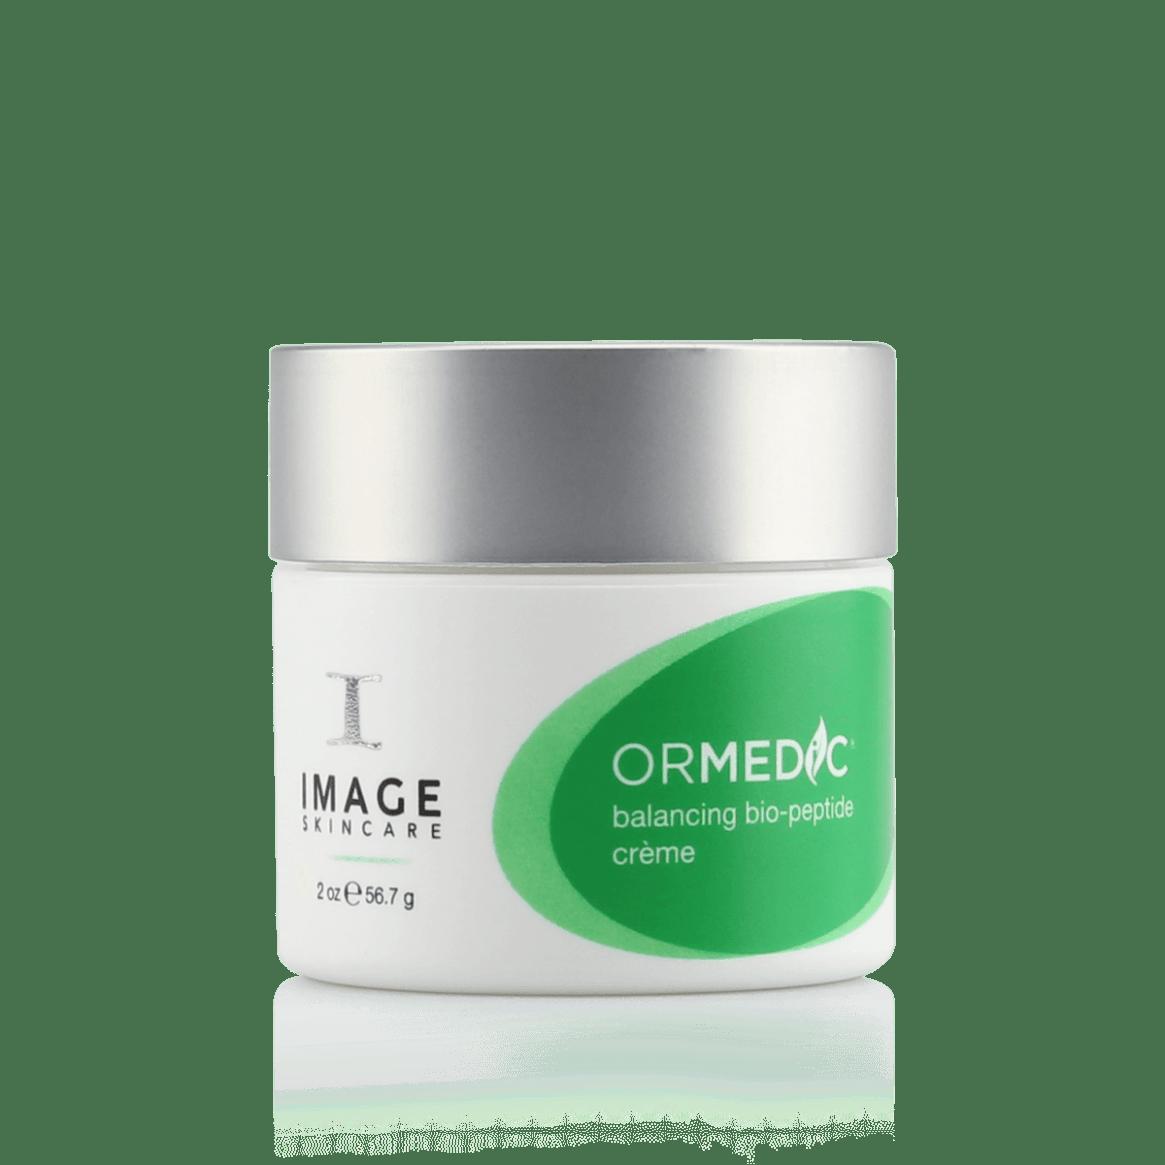 IMAGE Skincare ORMEDIC balancing bio-peptide cream